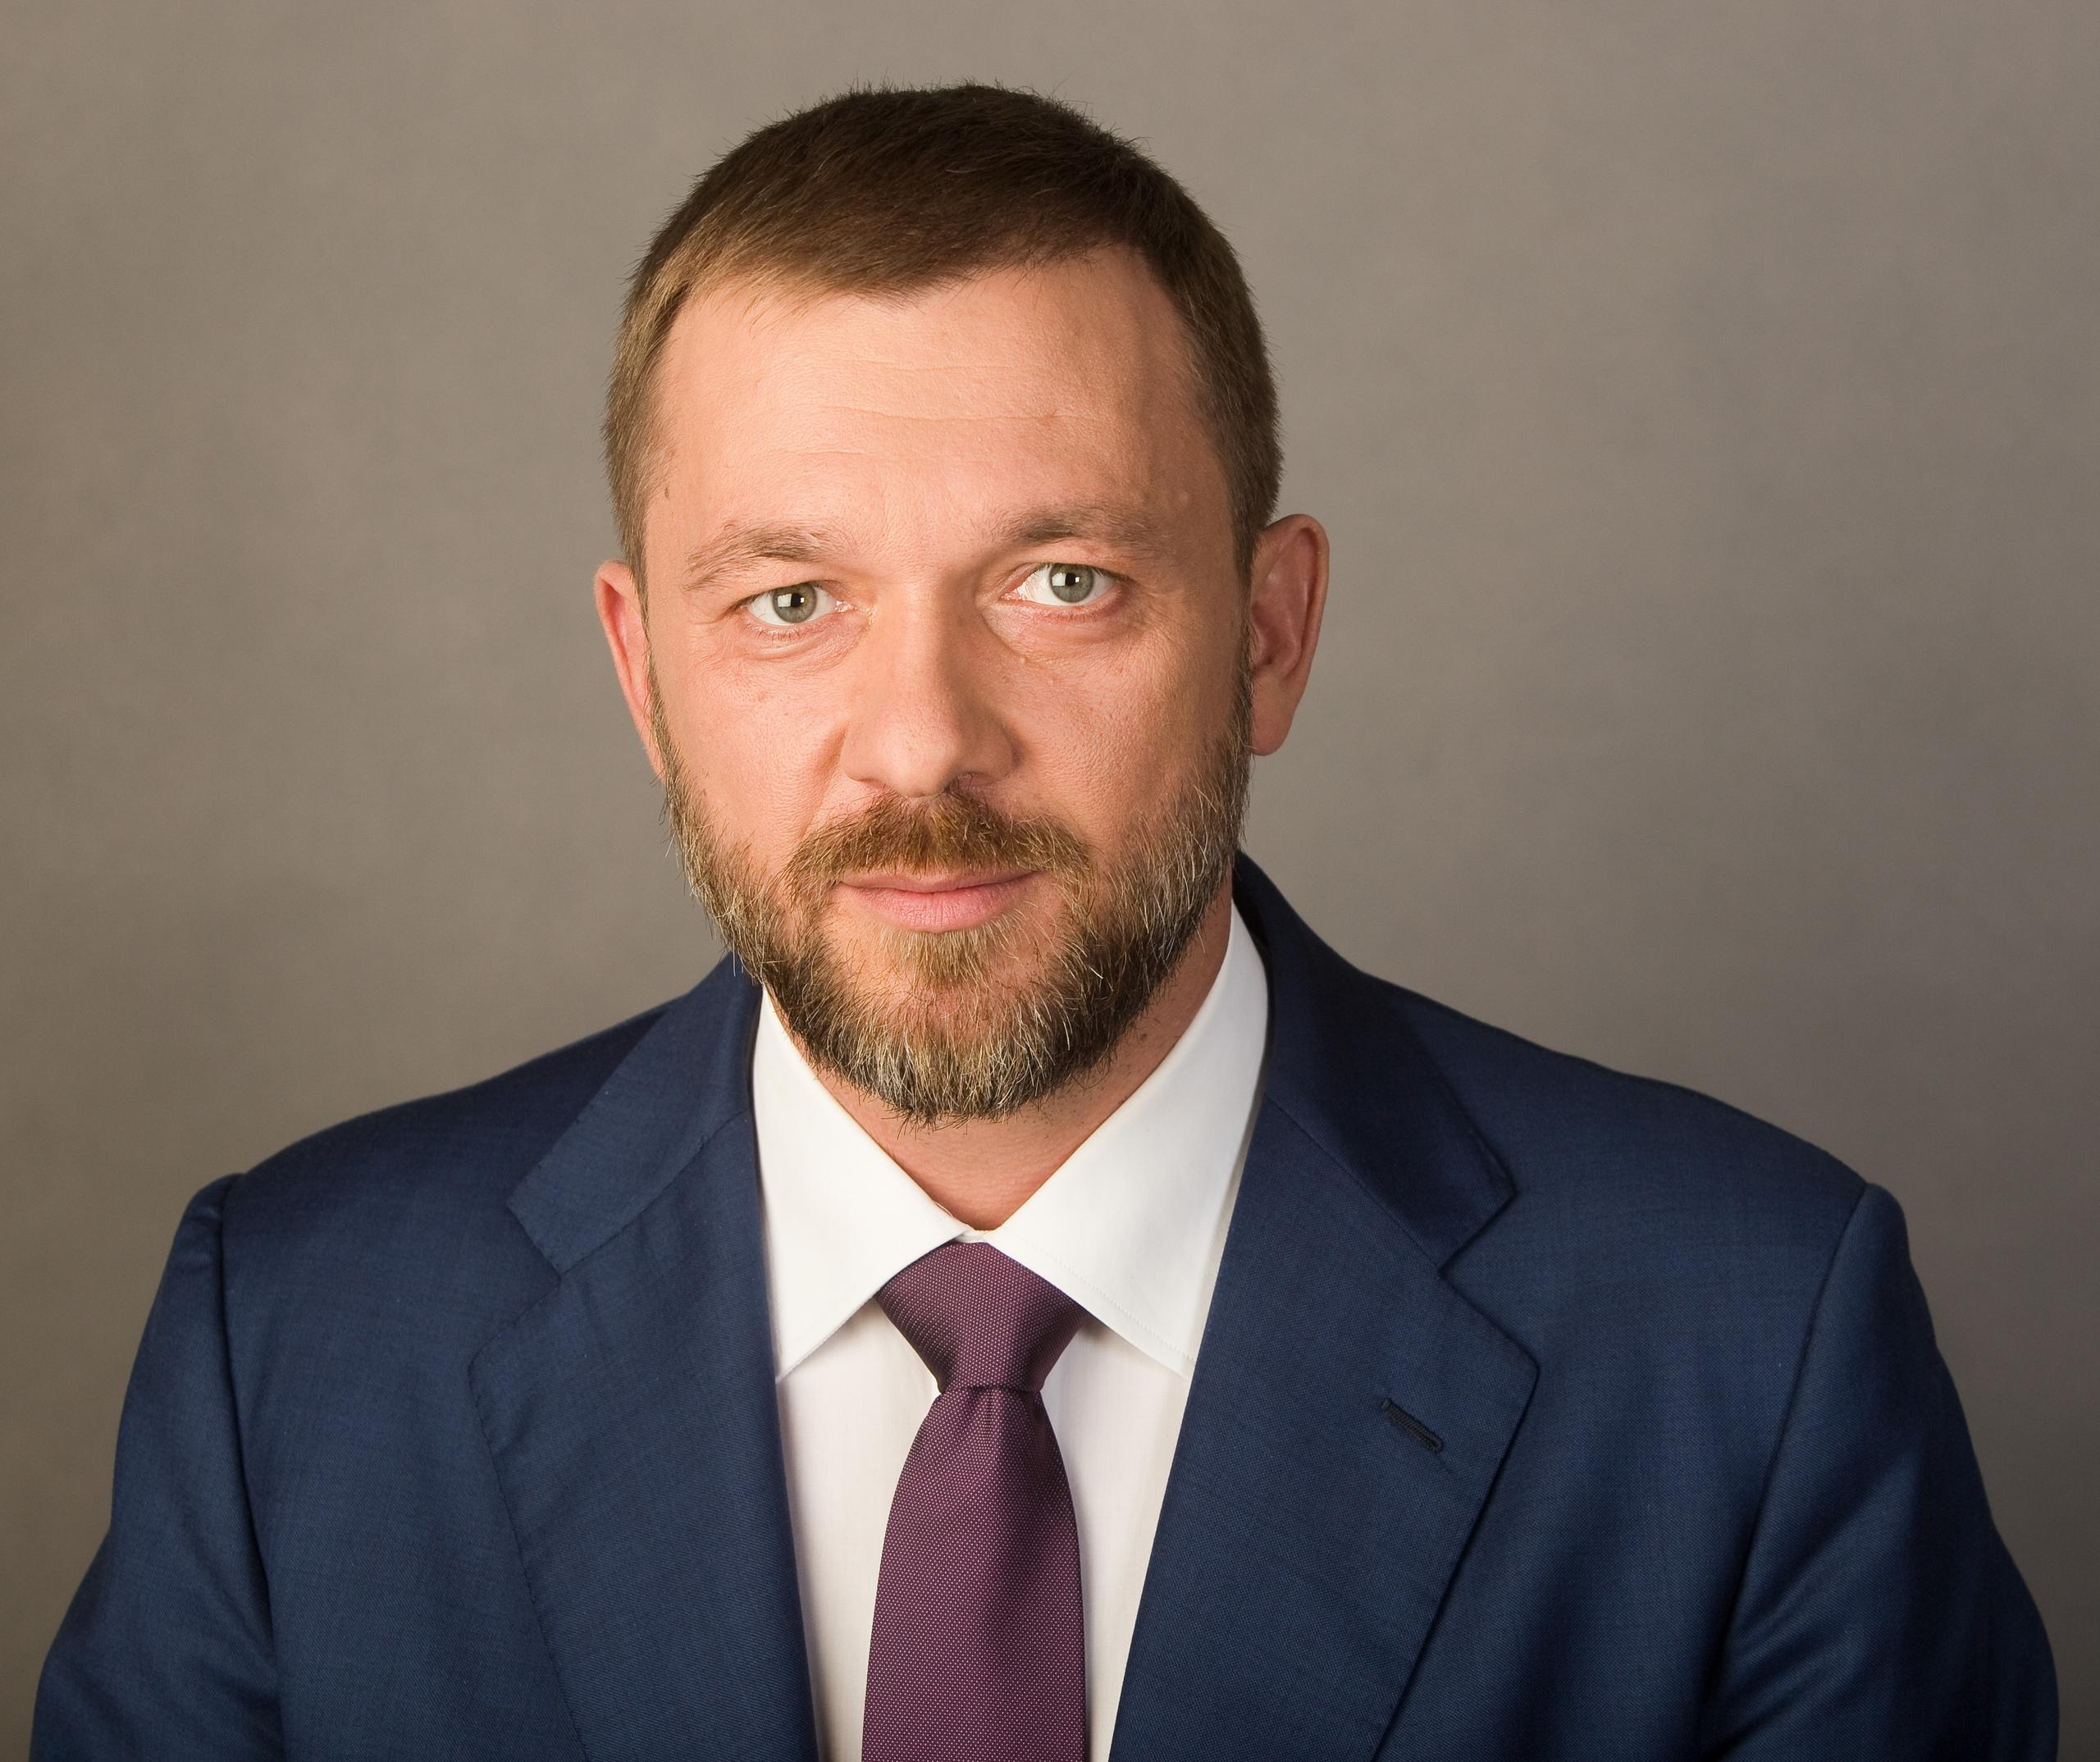 Ваш старый знакомый, Саблин Дмитрий Вадимович (202 ИО)